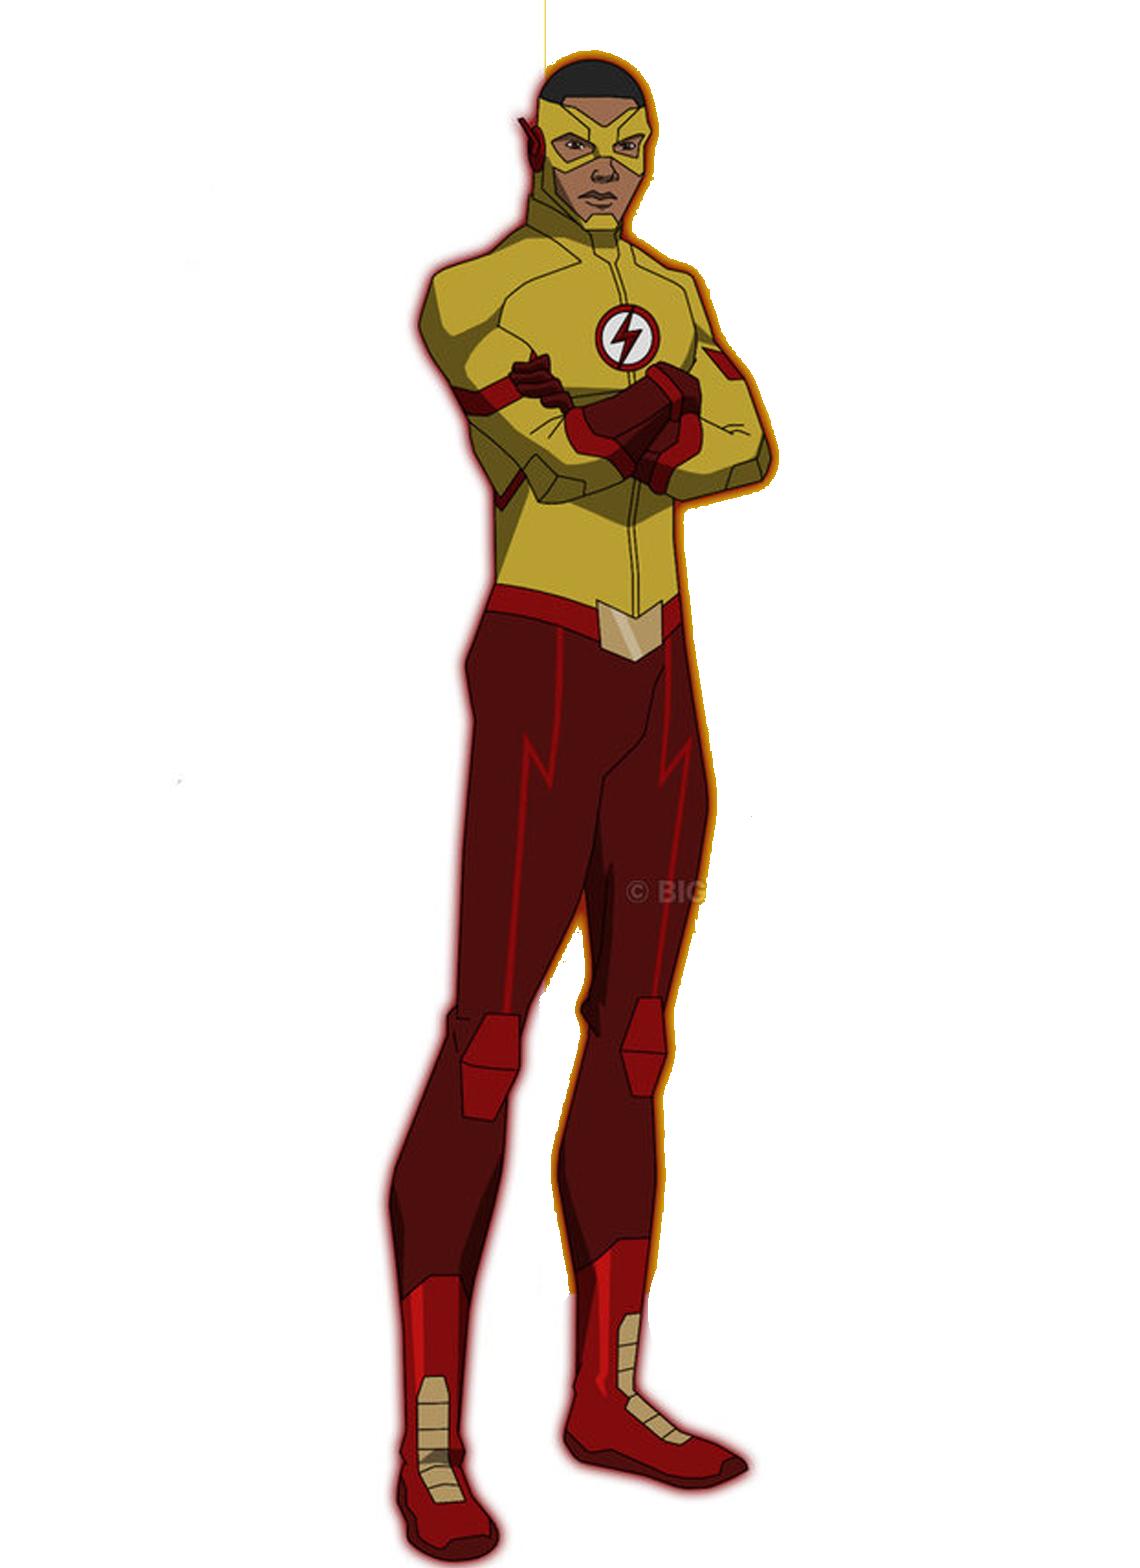 Kid Flash Wally West Kid Flash Dc Comics Superhero